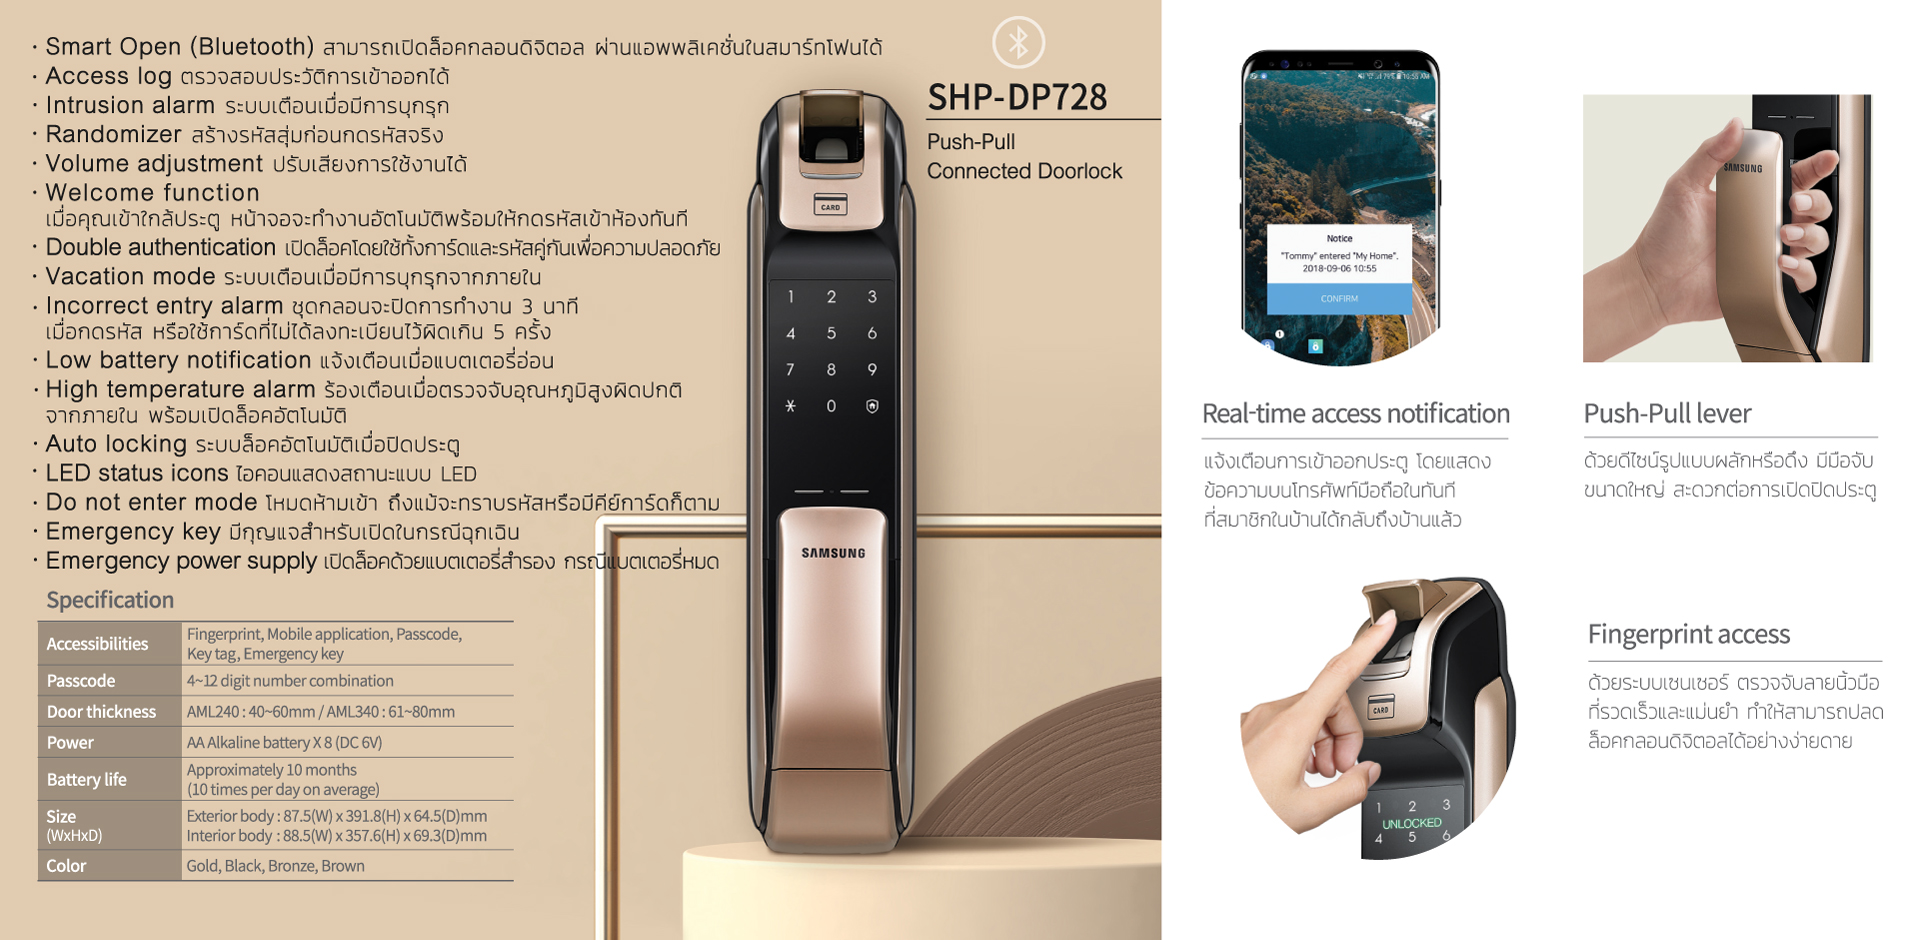 Samsung Digital Door Lock 728, ประตูดิจิตอล Samsung